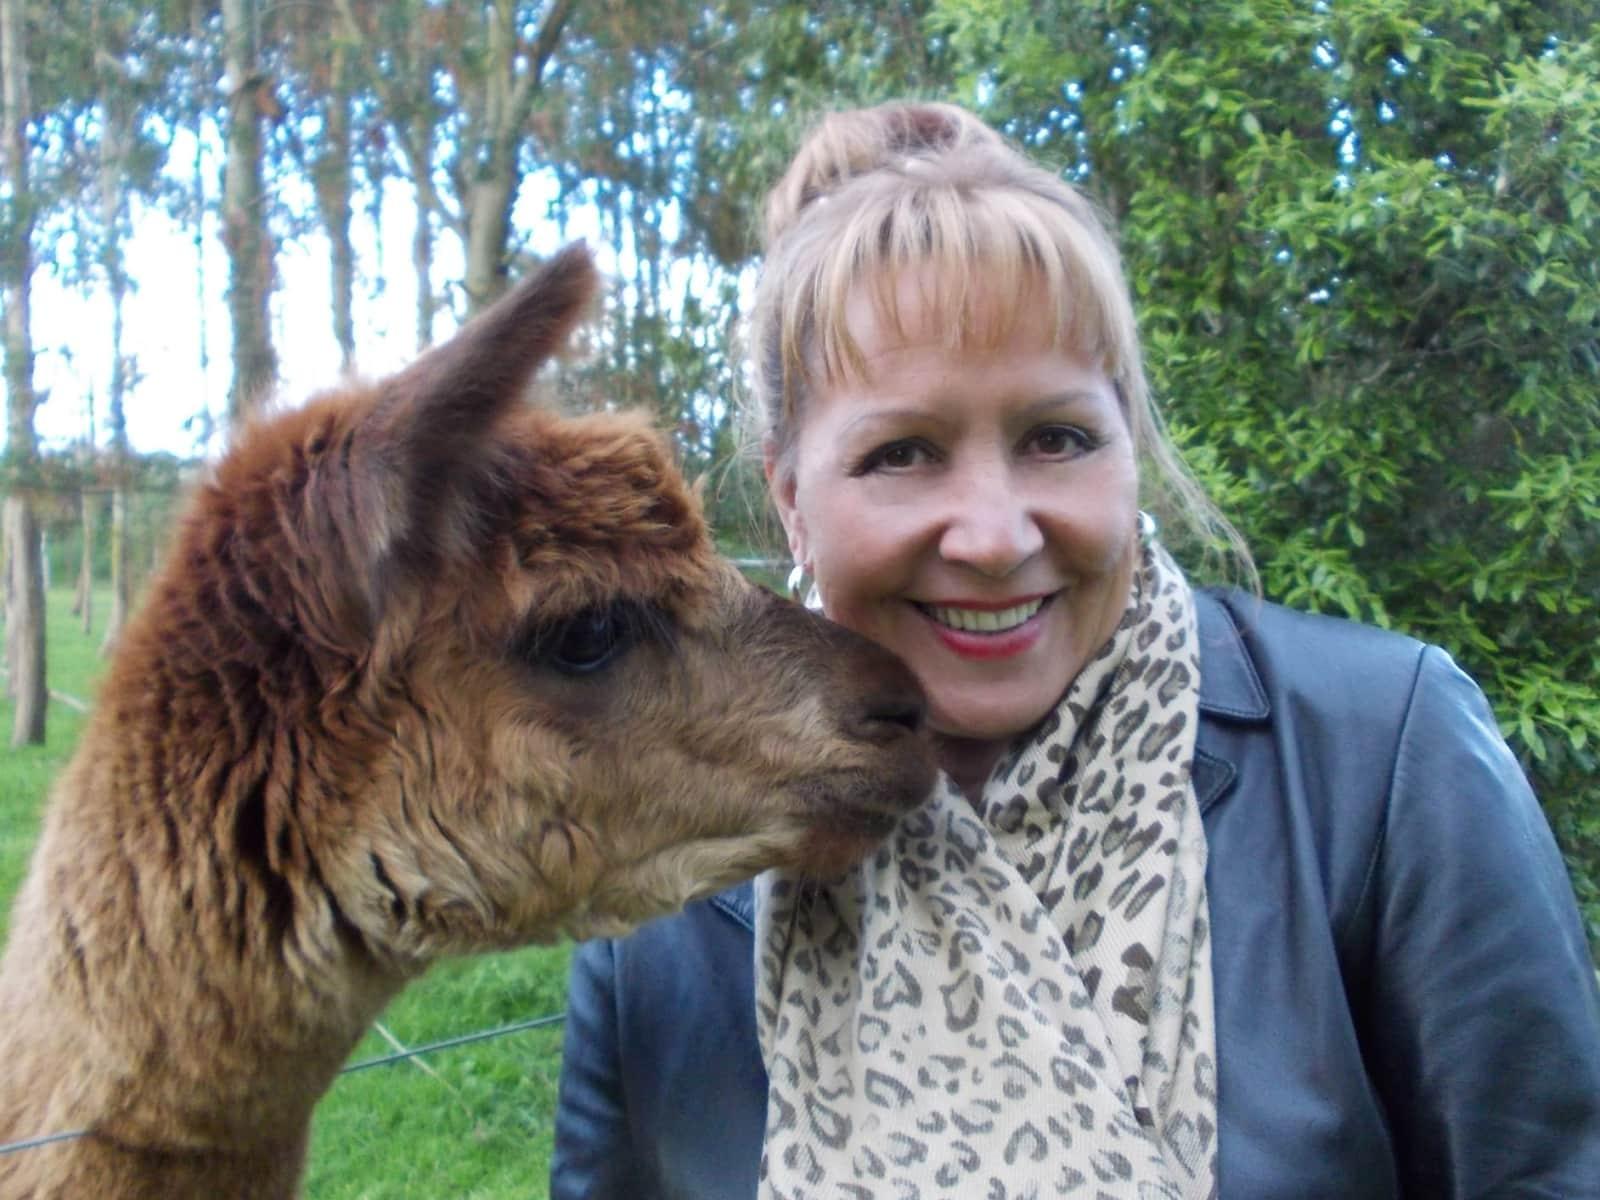 Christine from Lower Hutt, New Zealand